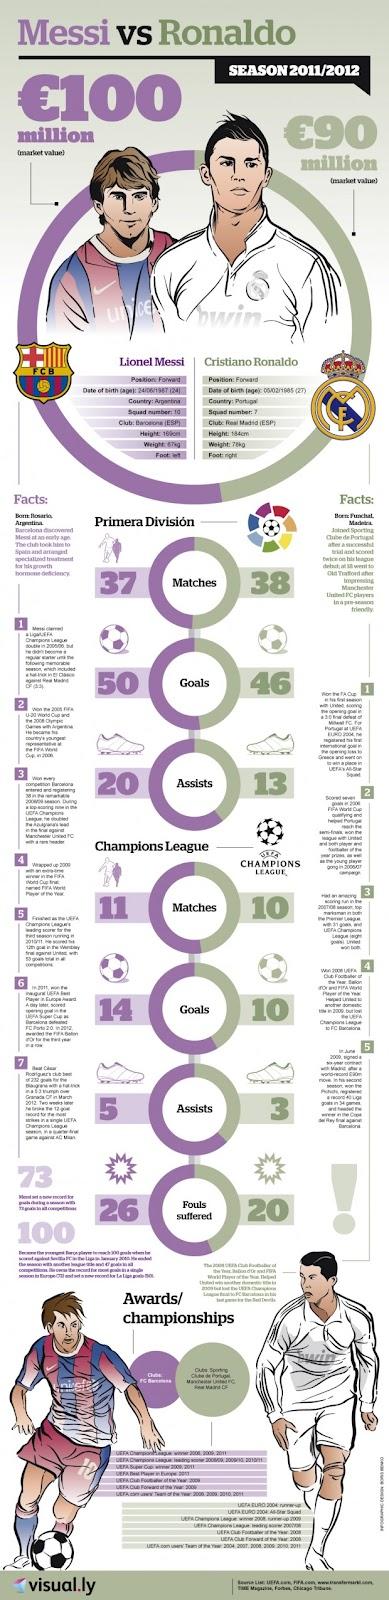 Messi - Ronaldo 2012